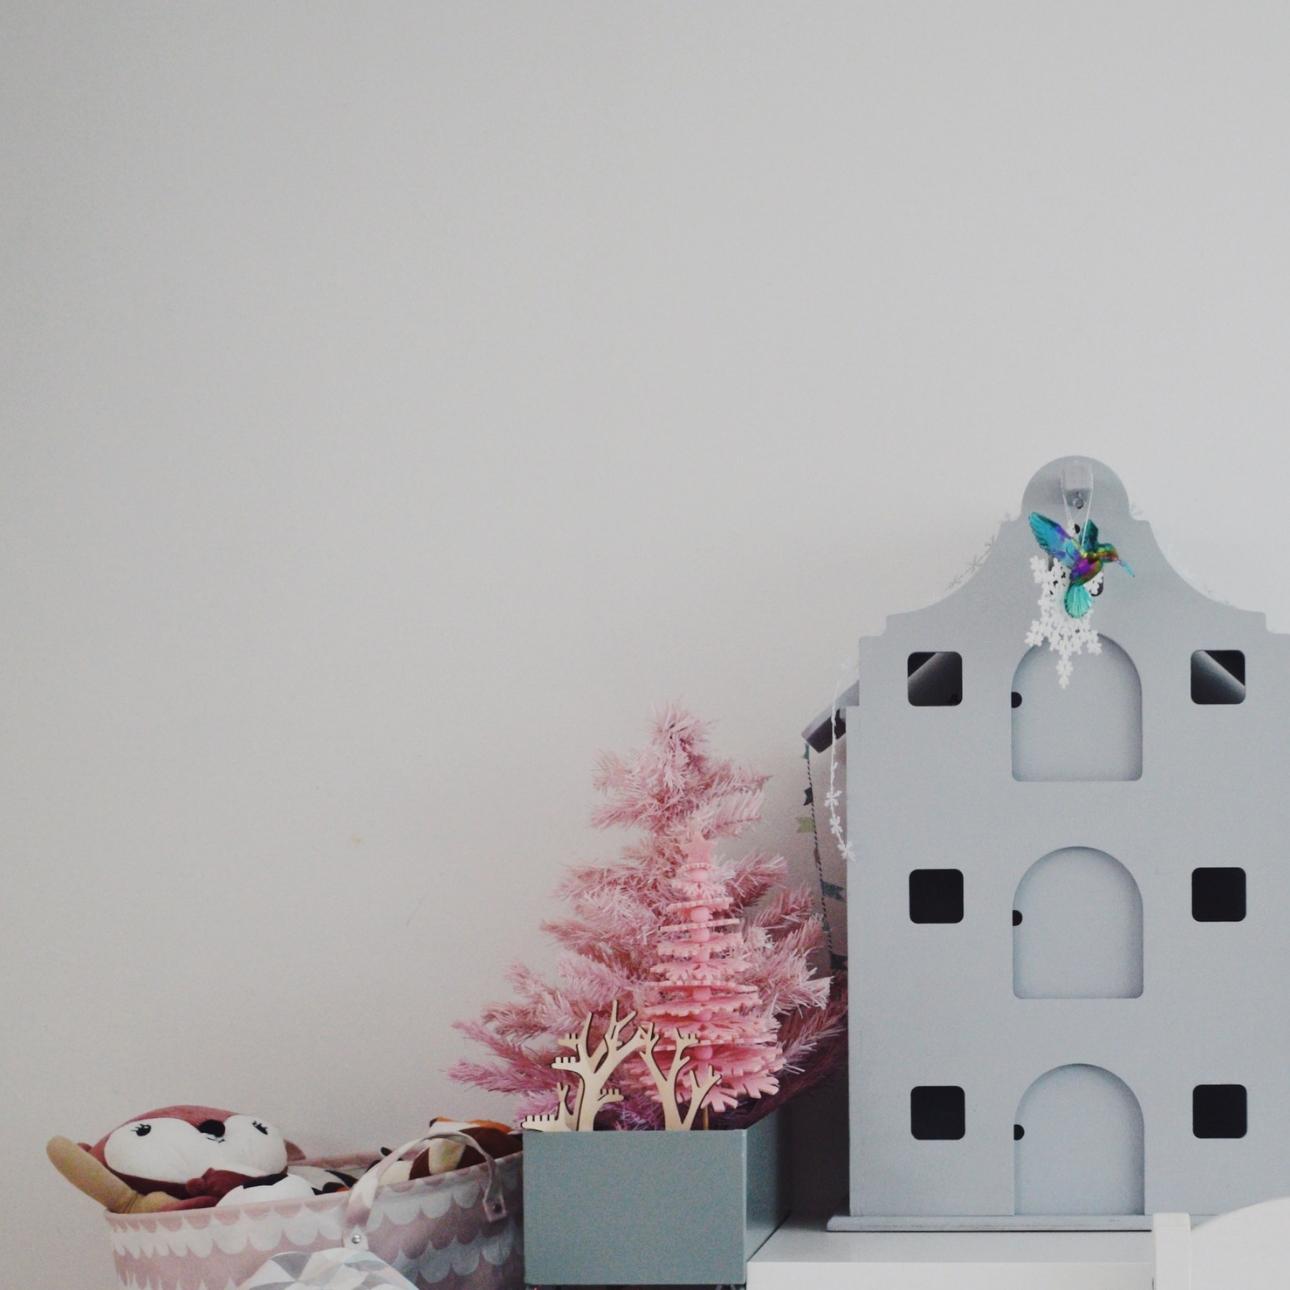 kersthuis 2018 roze kerstbomen pakhuis